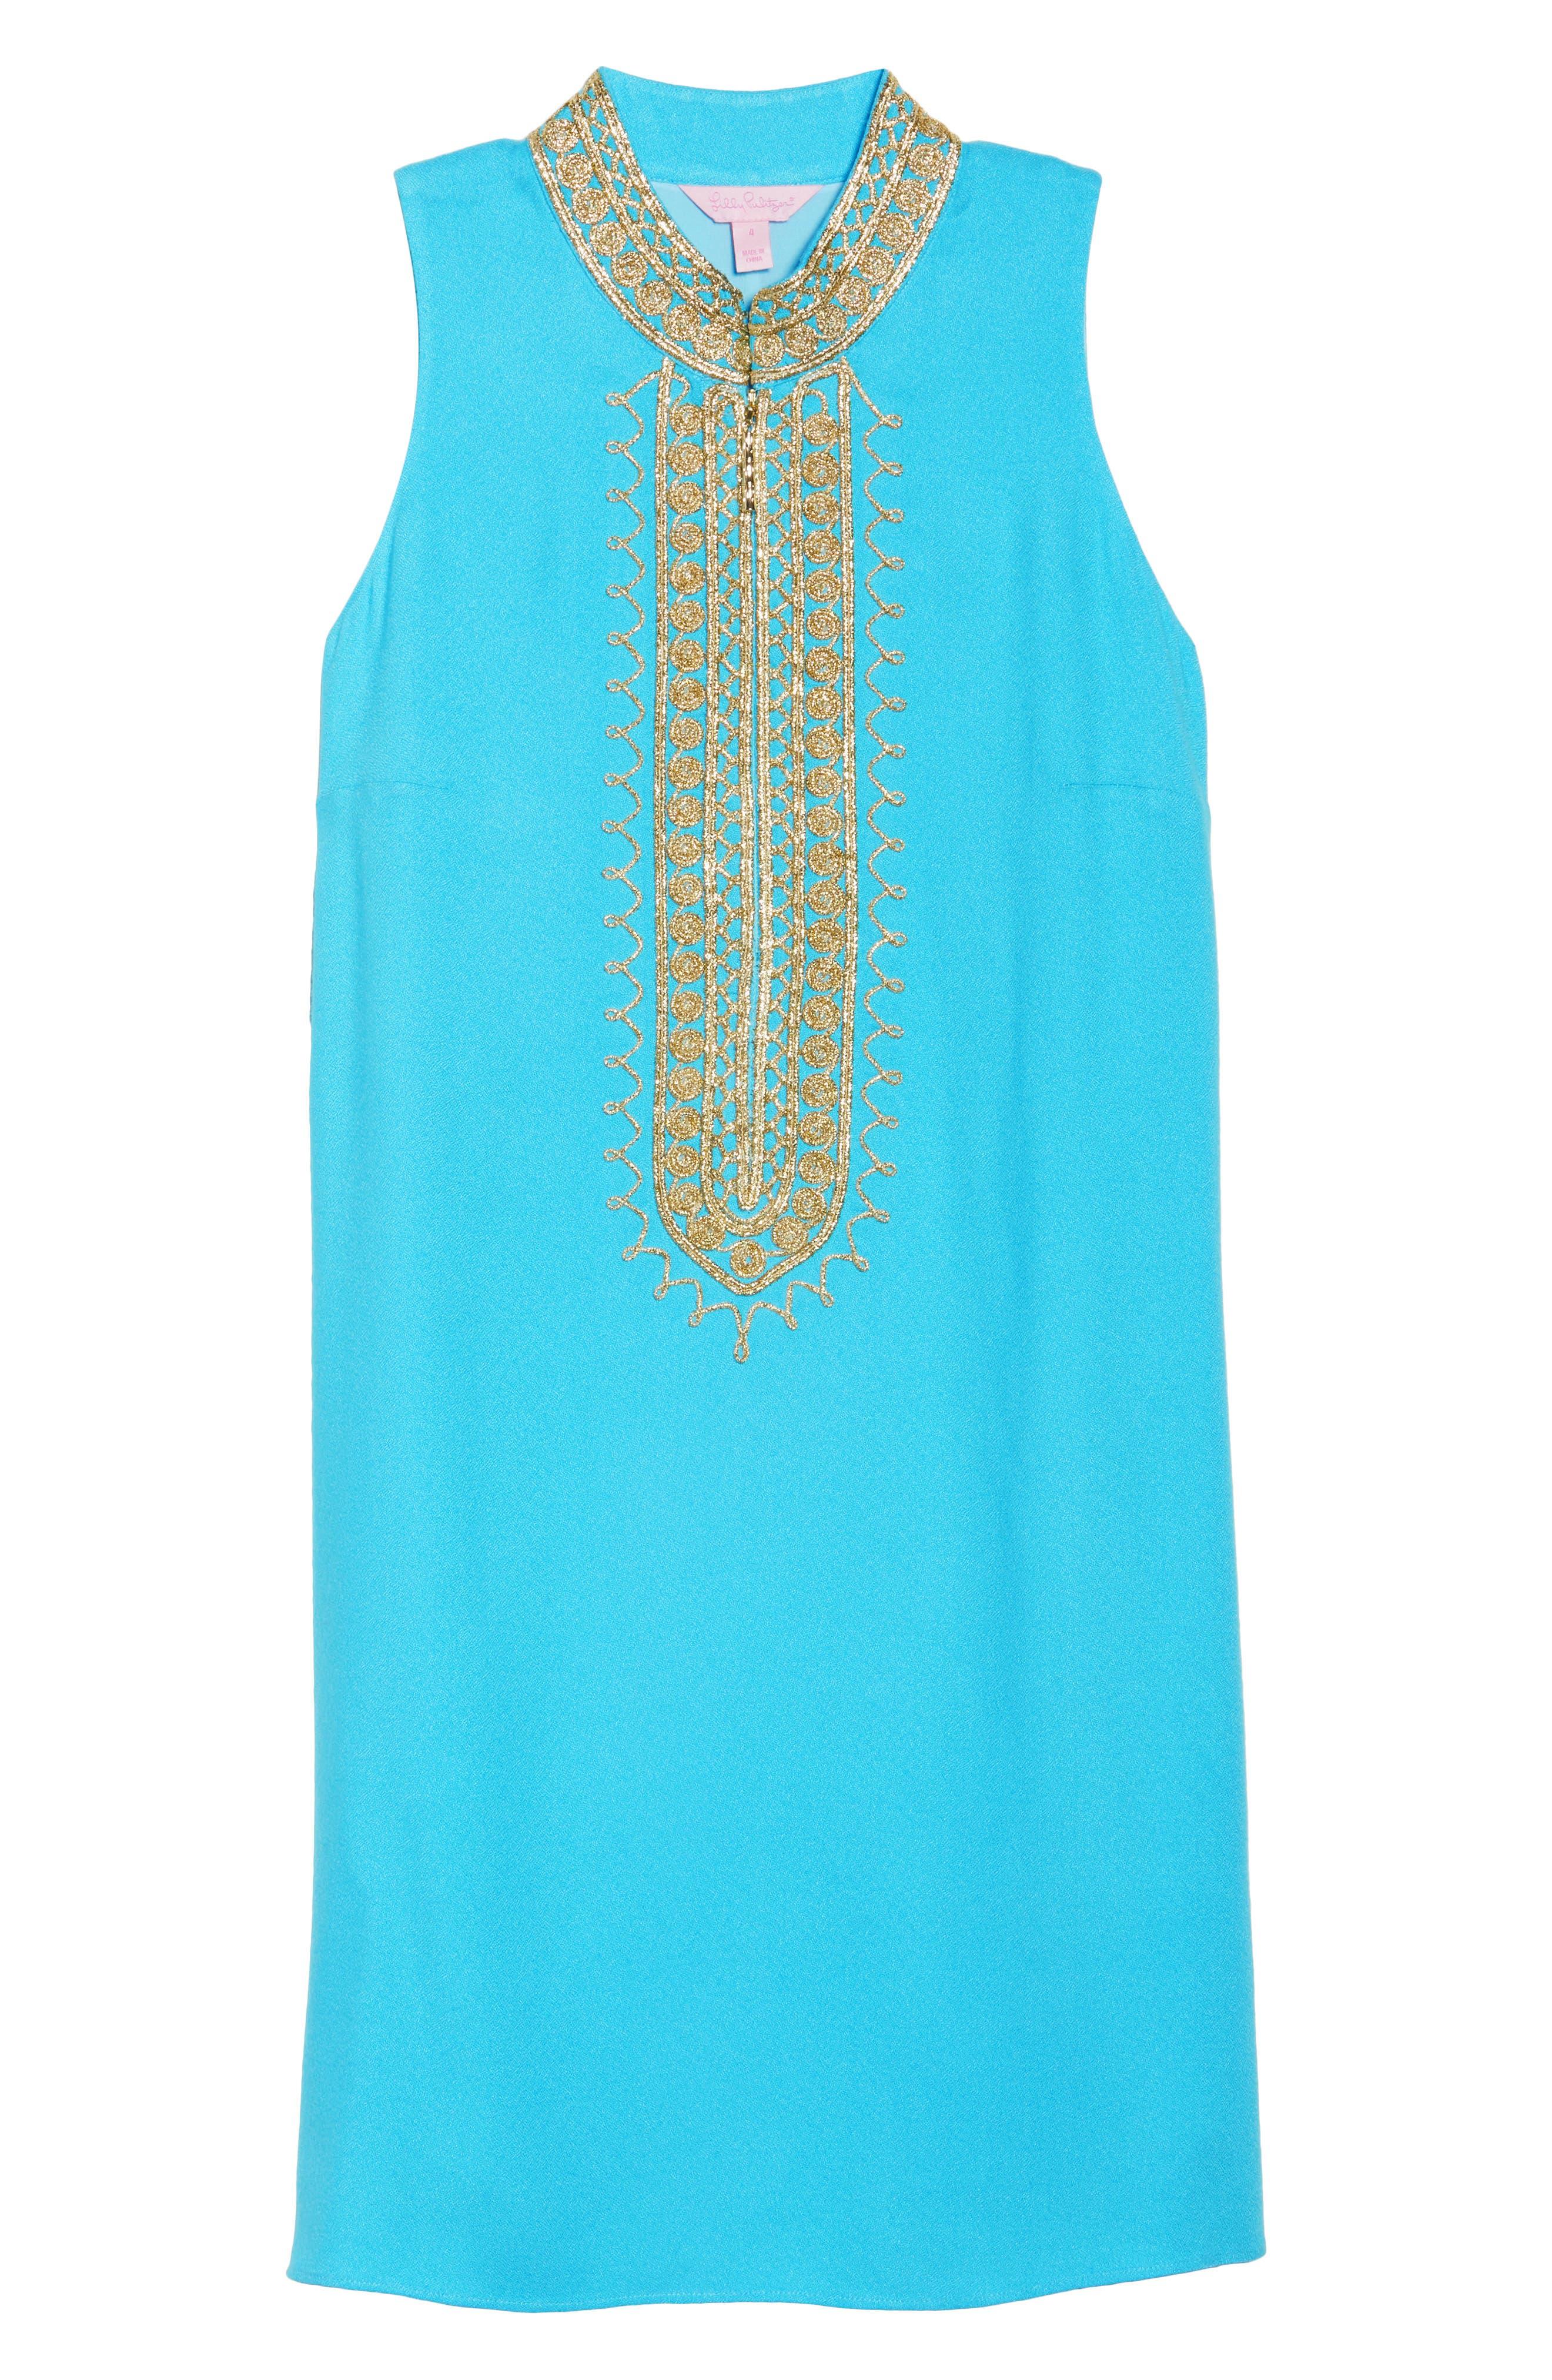 Jane Embroidered Shift Dress,                             Alternate thumbnail 7, color,                             Blue Ibiza